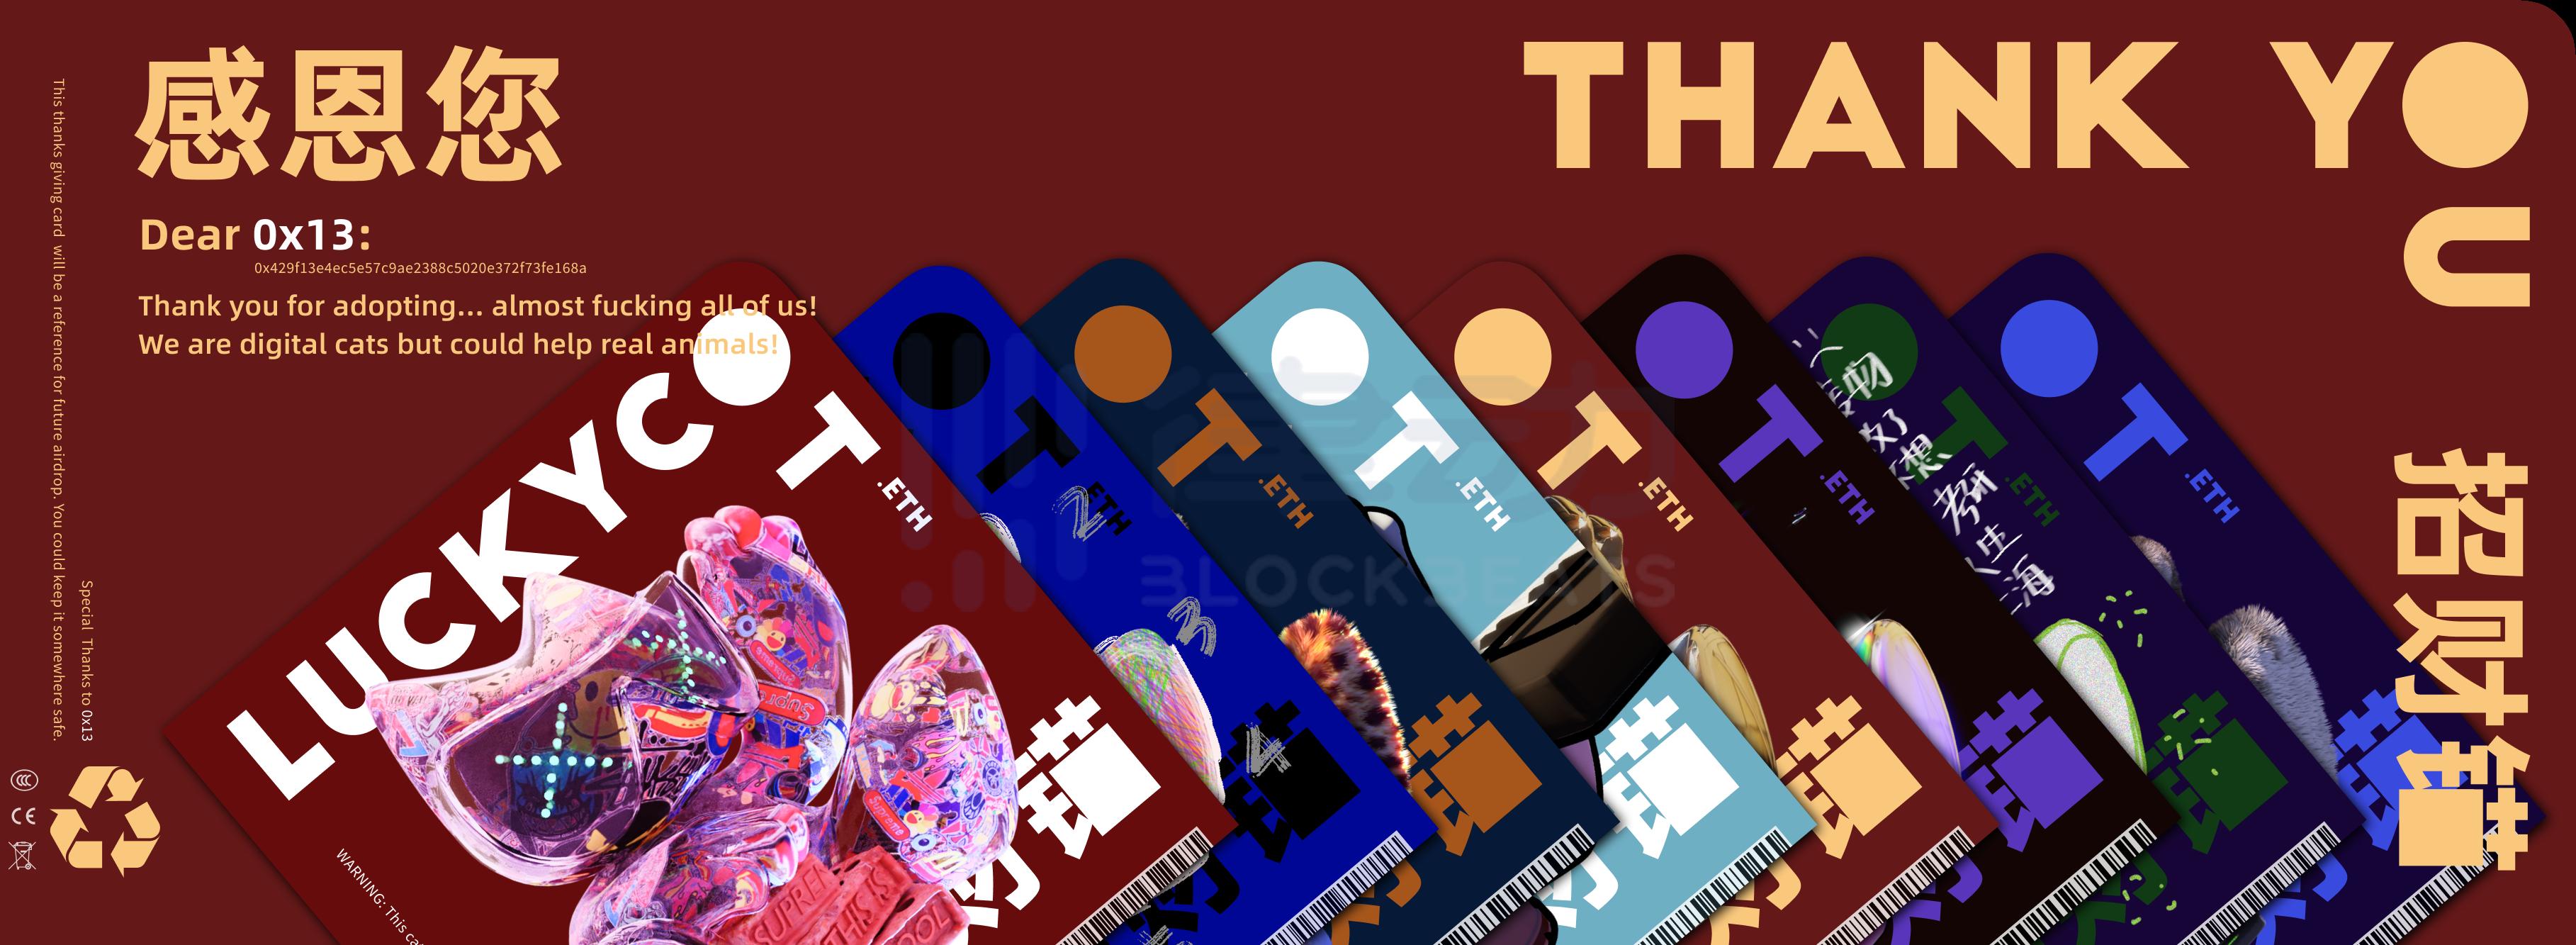 NFT的冰与火之歌:头像、加密艺术与平台